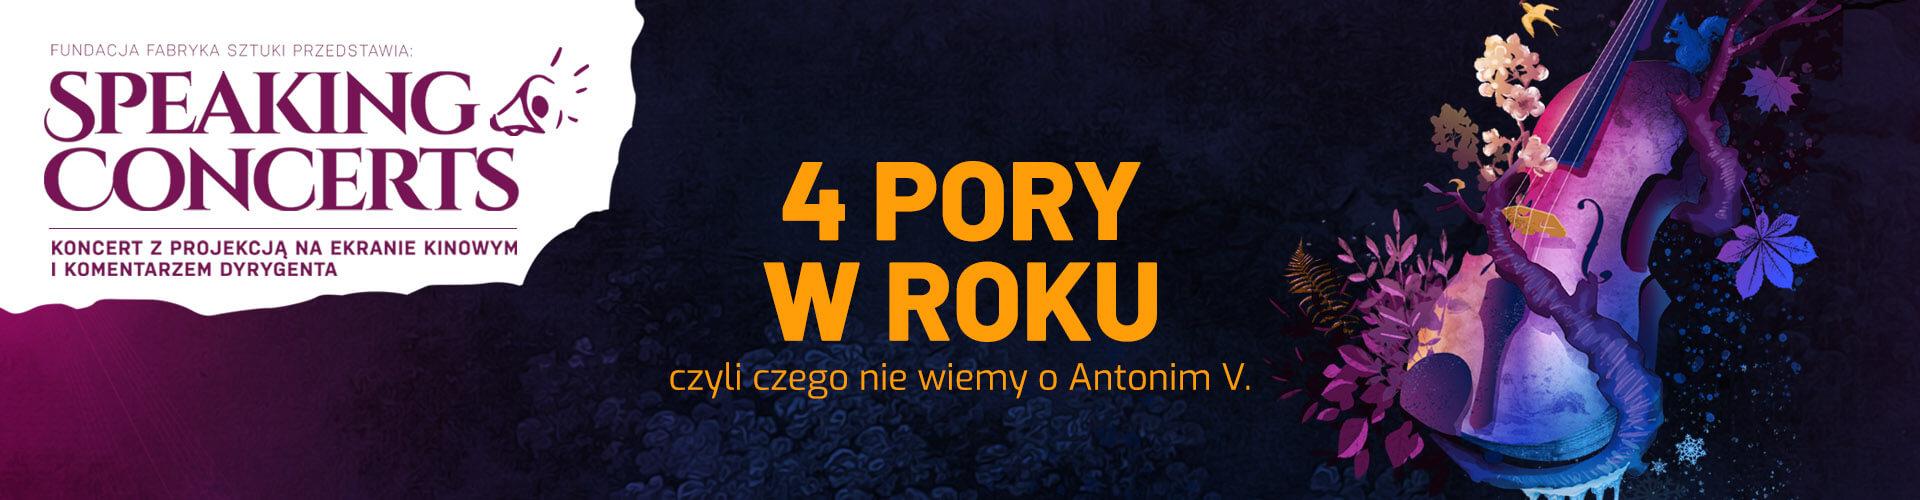 Speaking Concerts - Koncert 4 Pory w Roku - Vivaldi - Kraków ICE